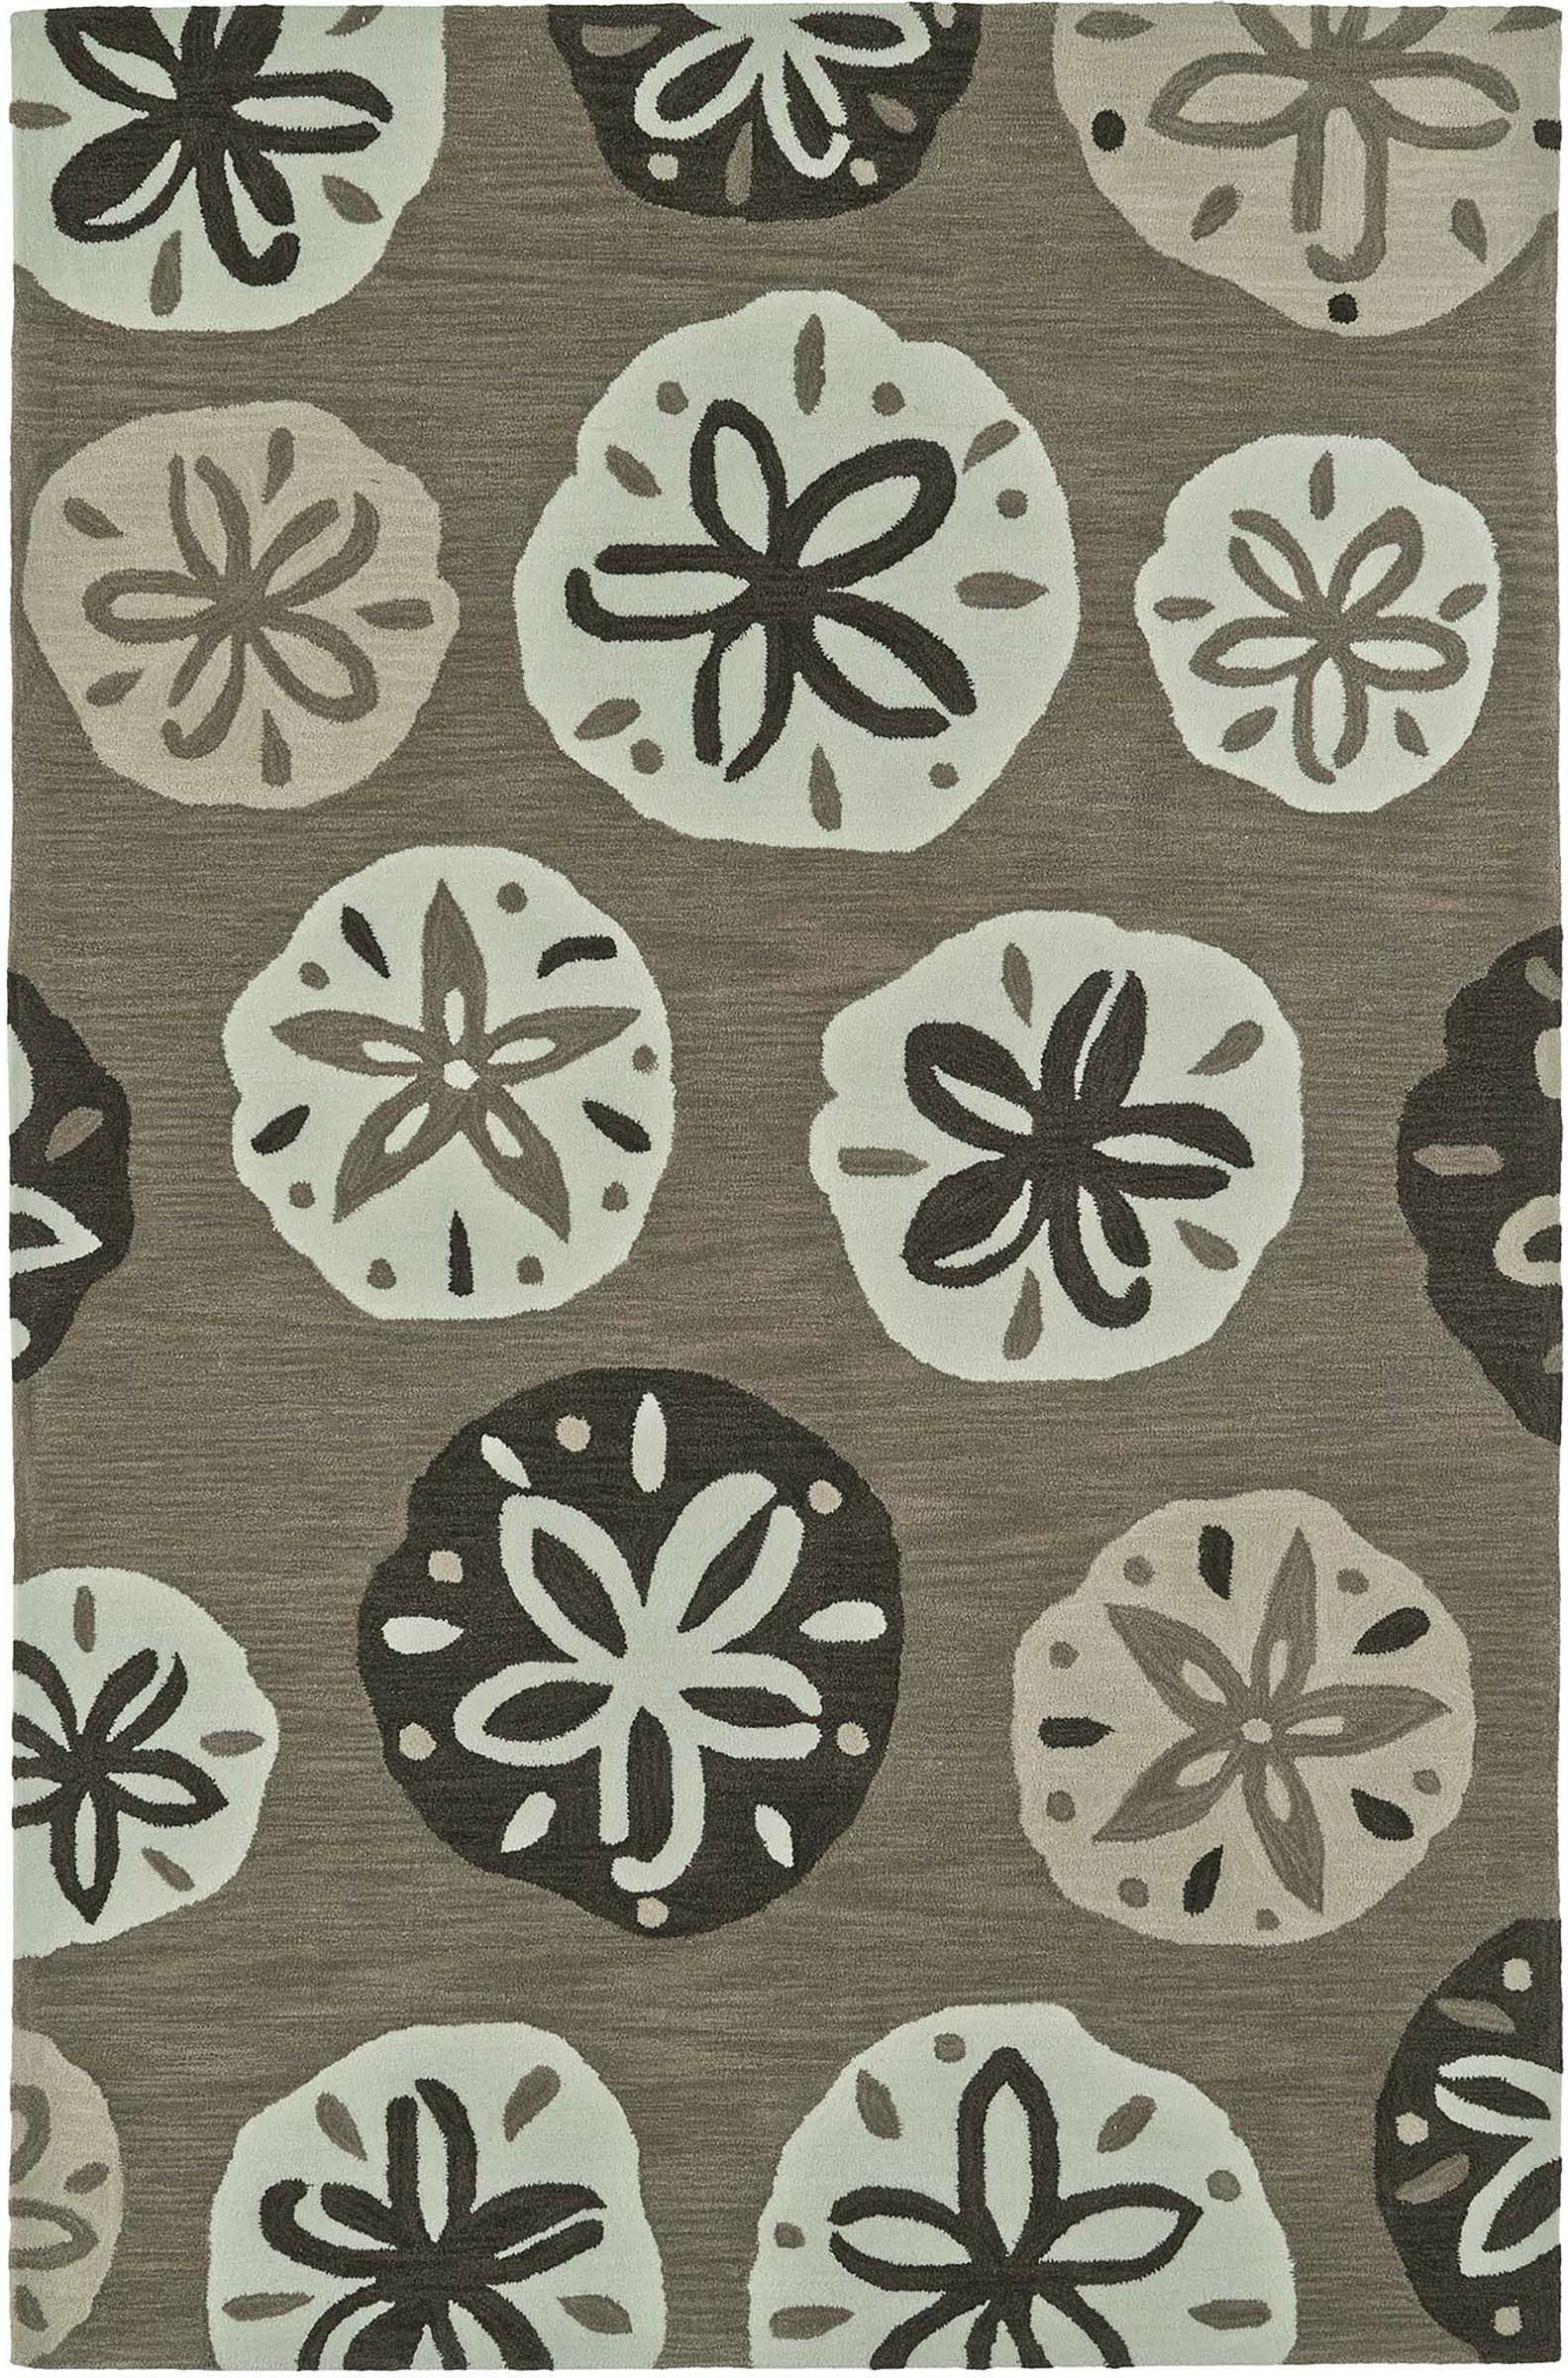 Bovina Hand-Tufted Khaki Area Rug Rug Size: Rectangle 8' x 10'